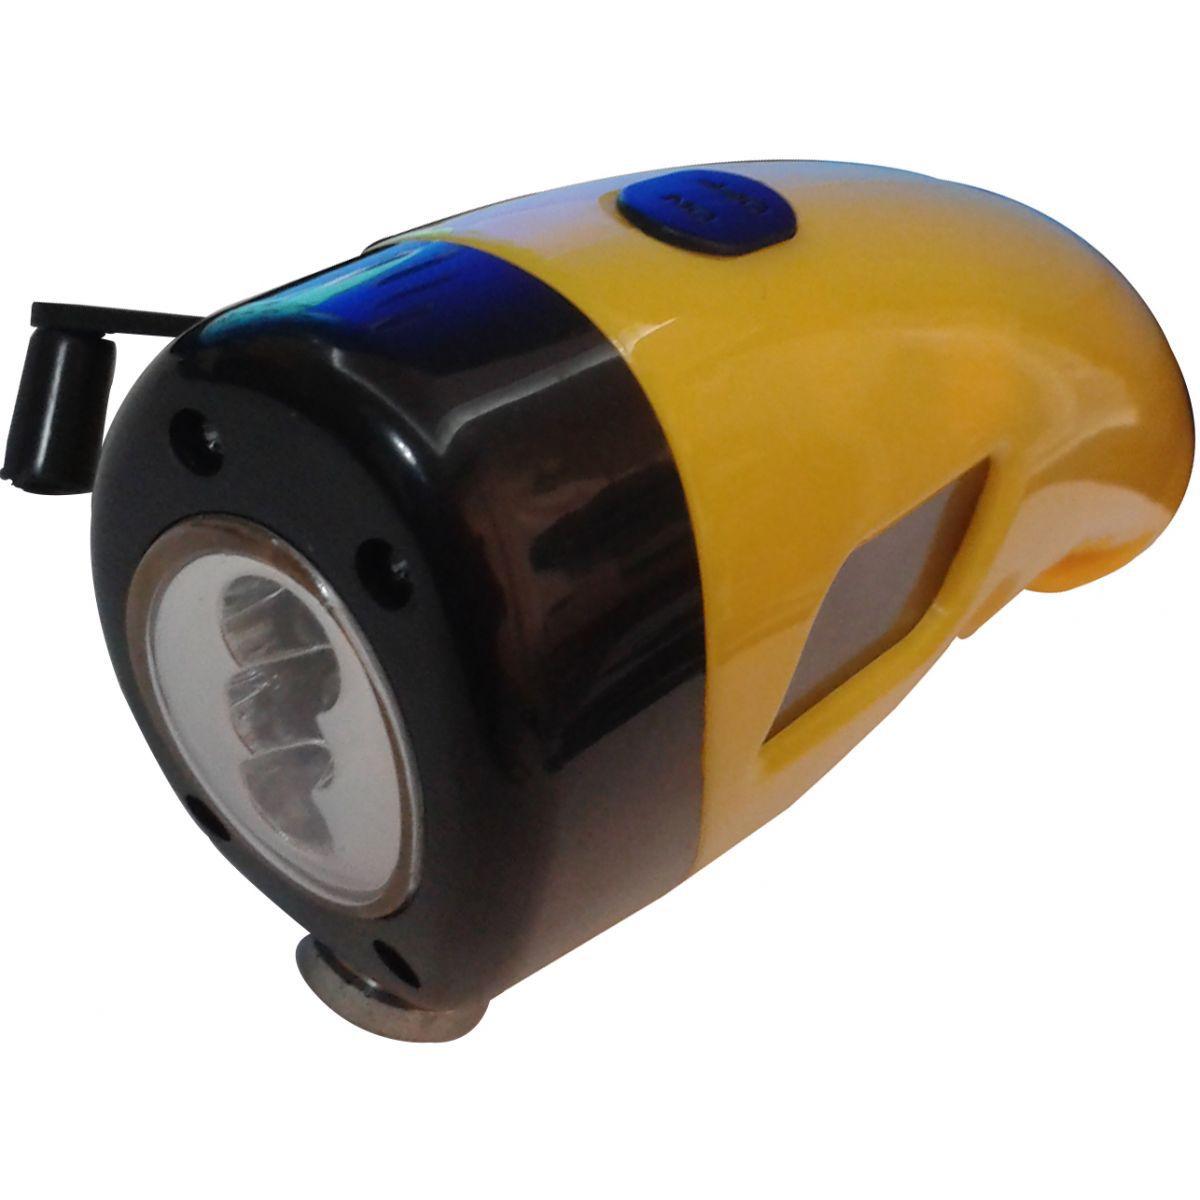 Lanterna Solar Dinâmico - Frete Grátis  - Thata Esportes